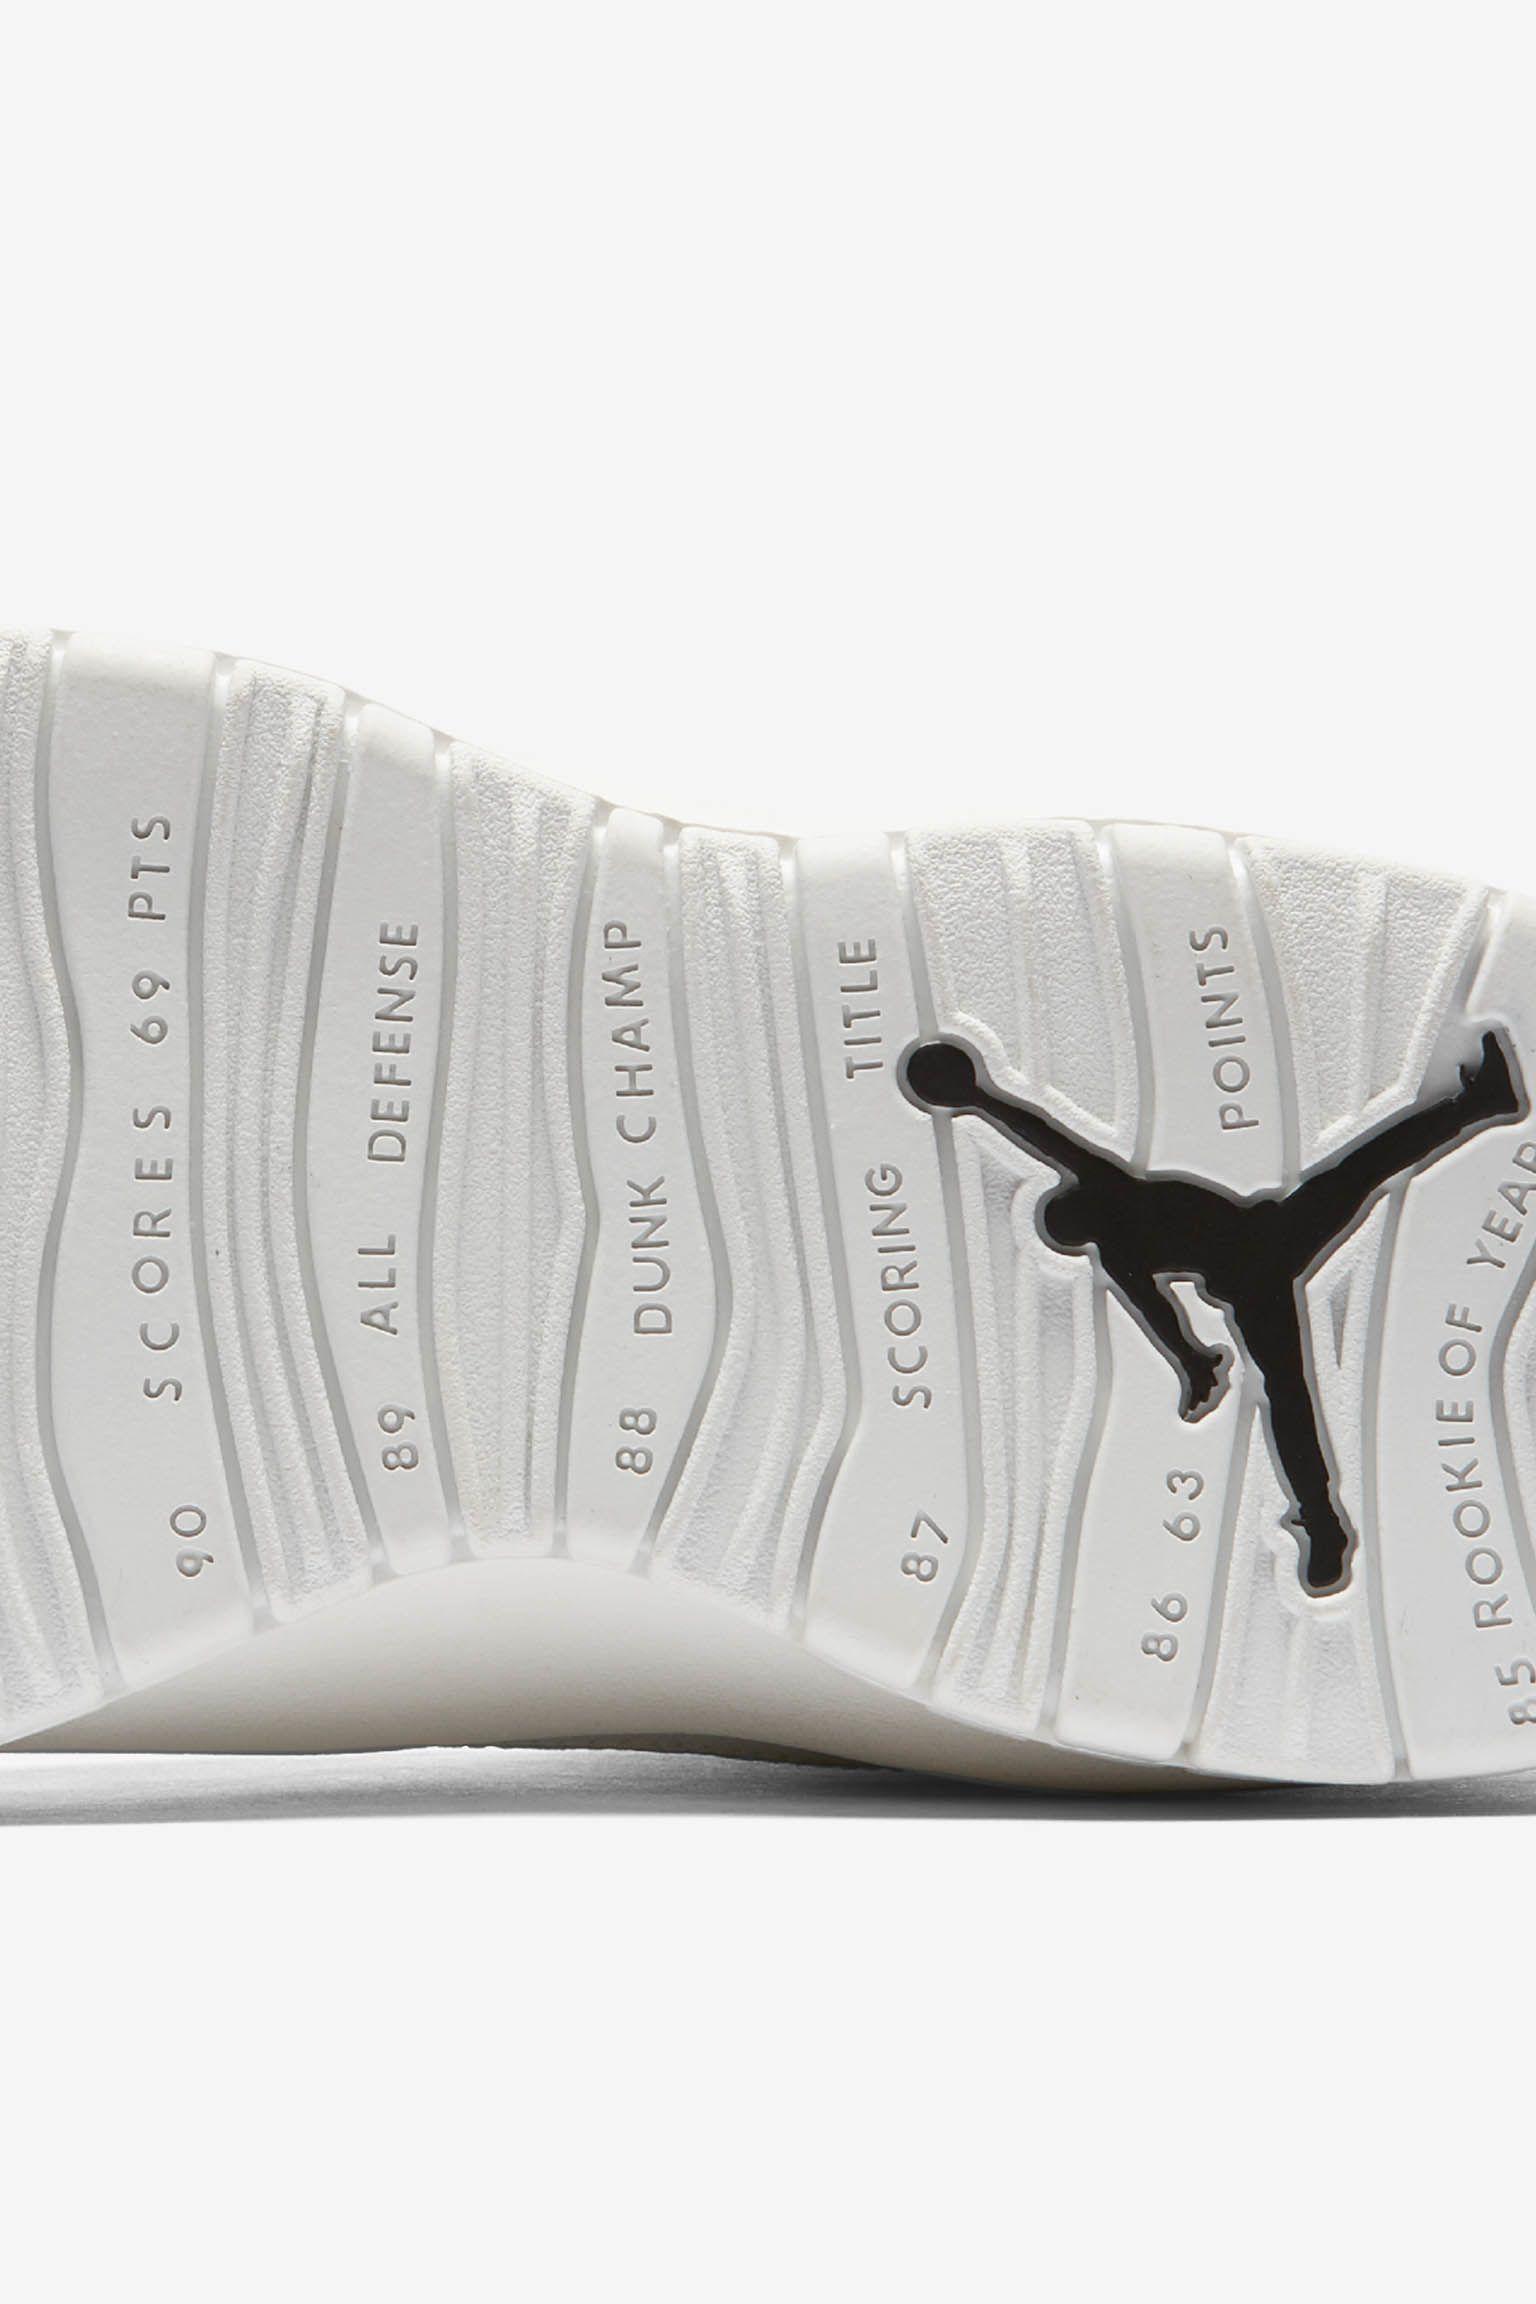 best sneakers ea327 03e0c Air Jordan 10 Retro  Summit White   Black  ...